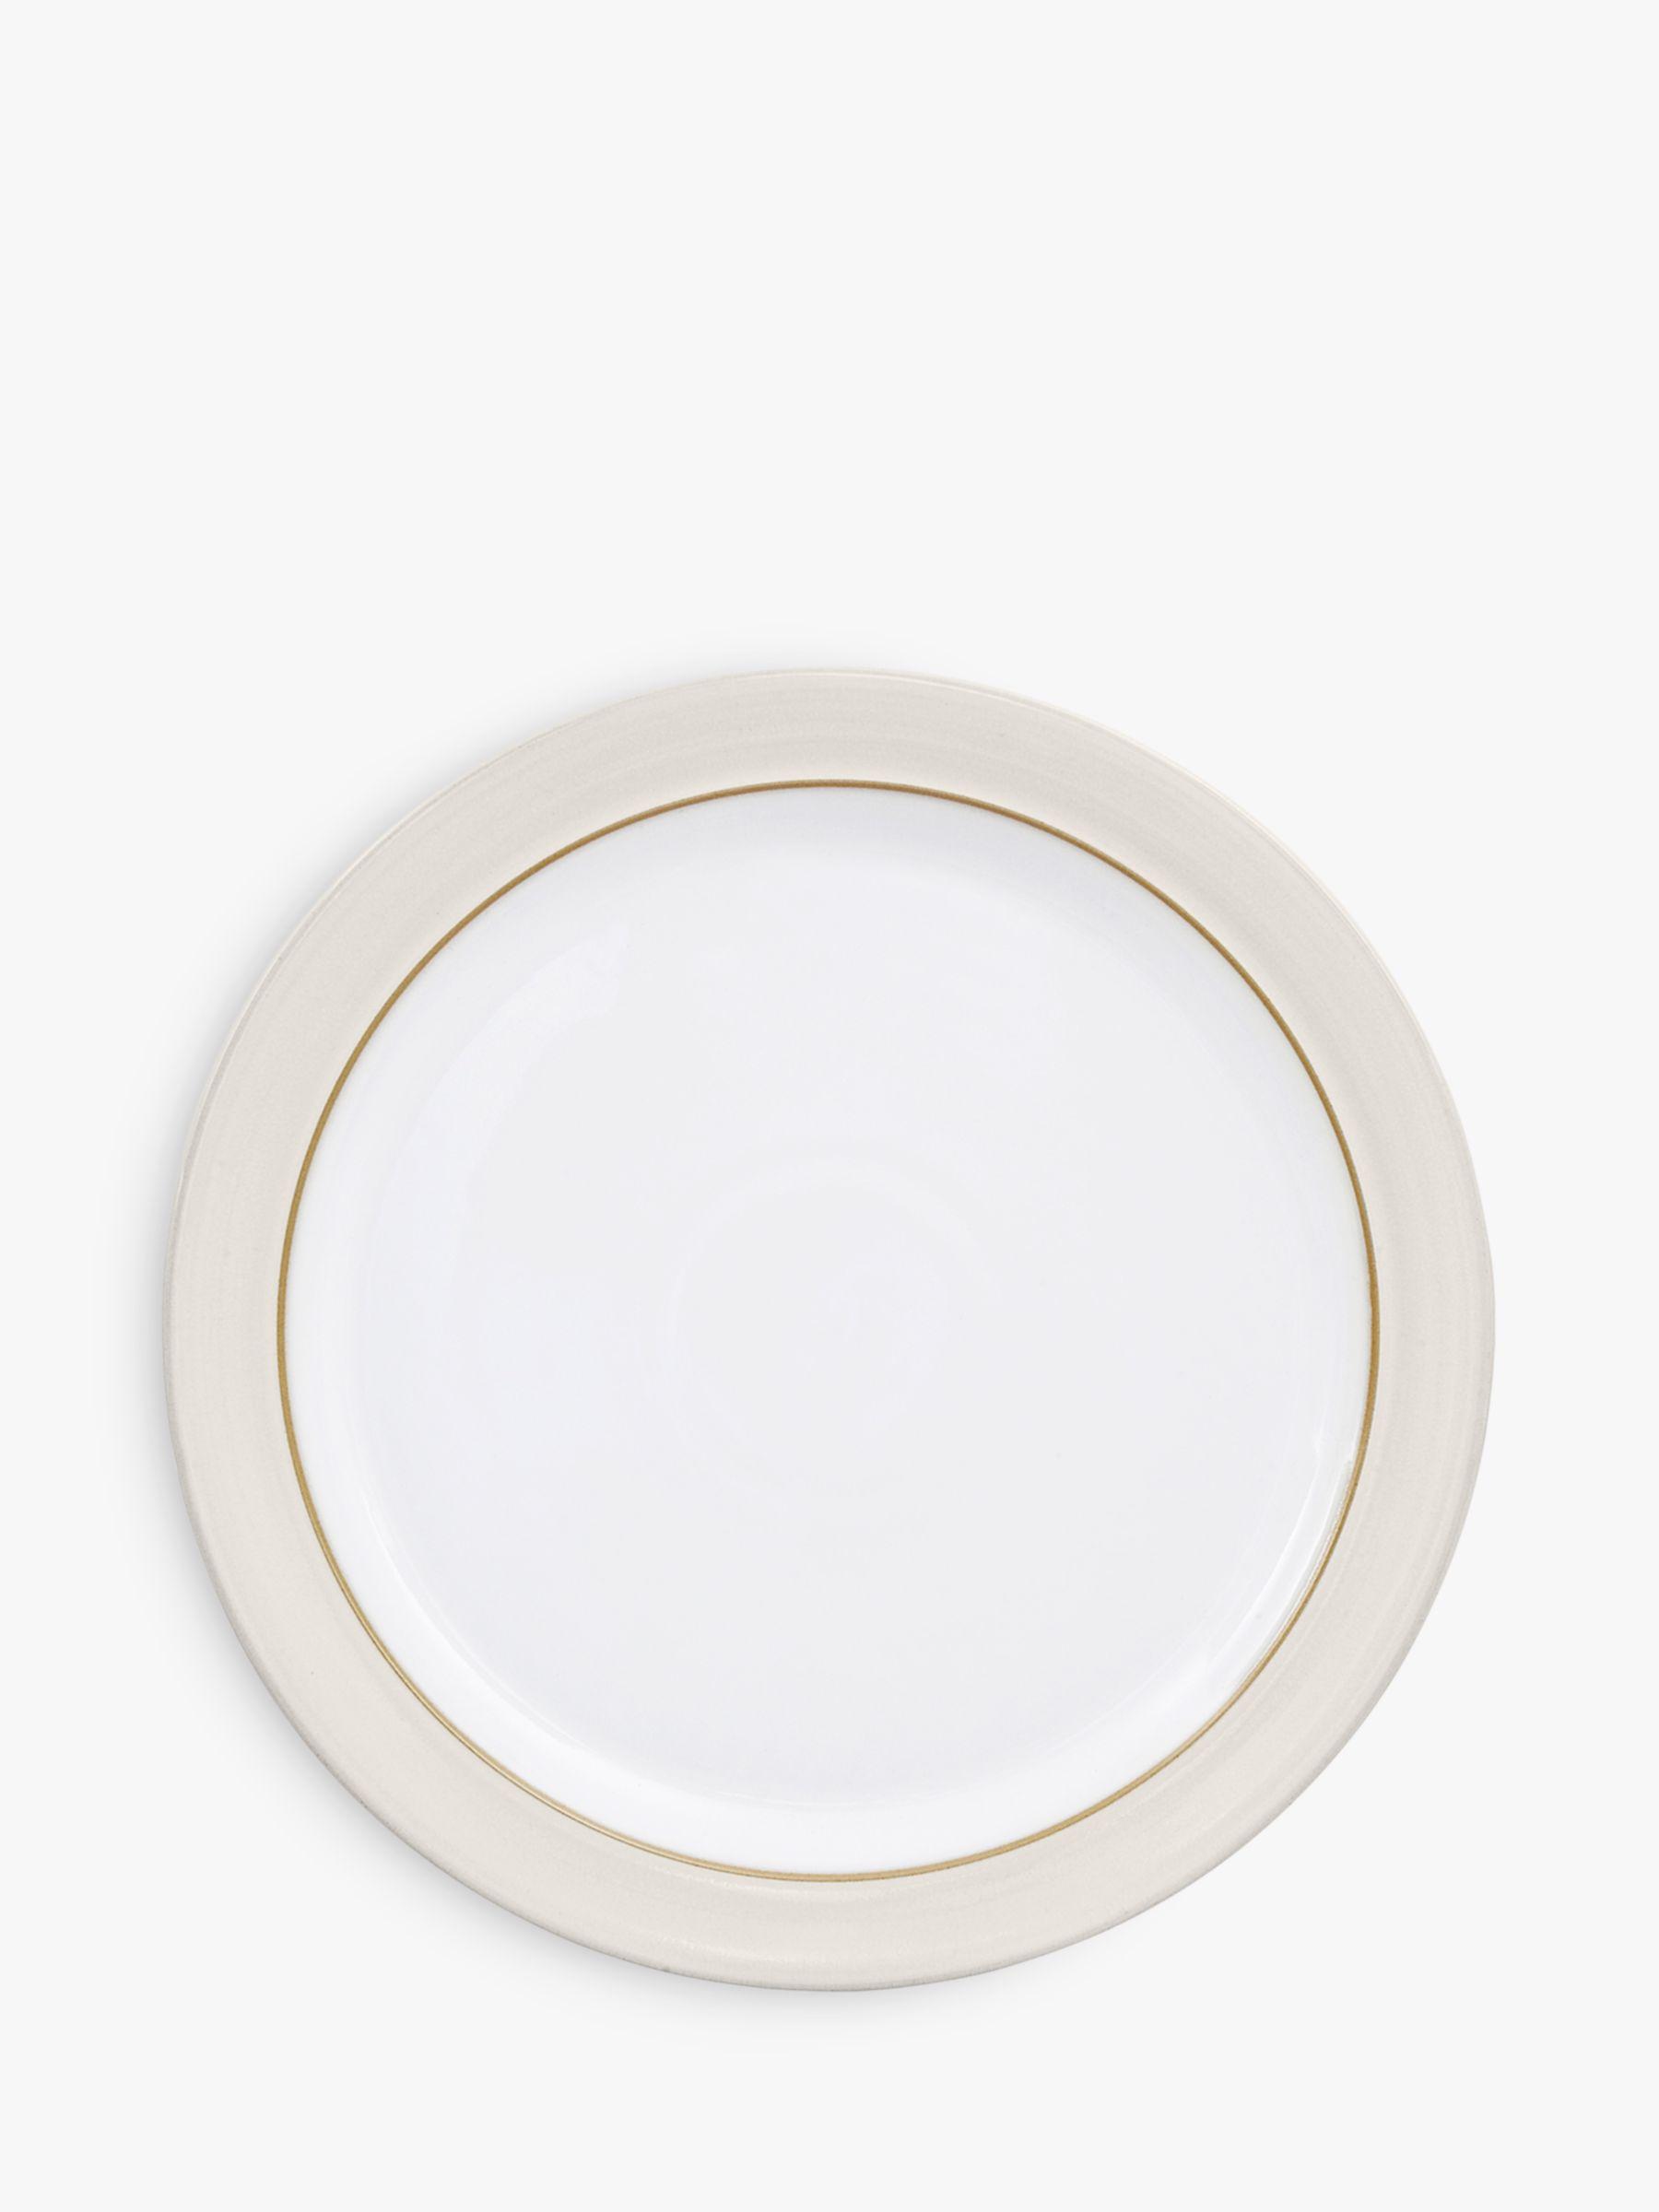 Denby USA Natural Canvas Salad Plate